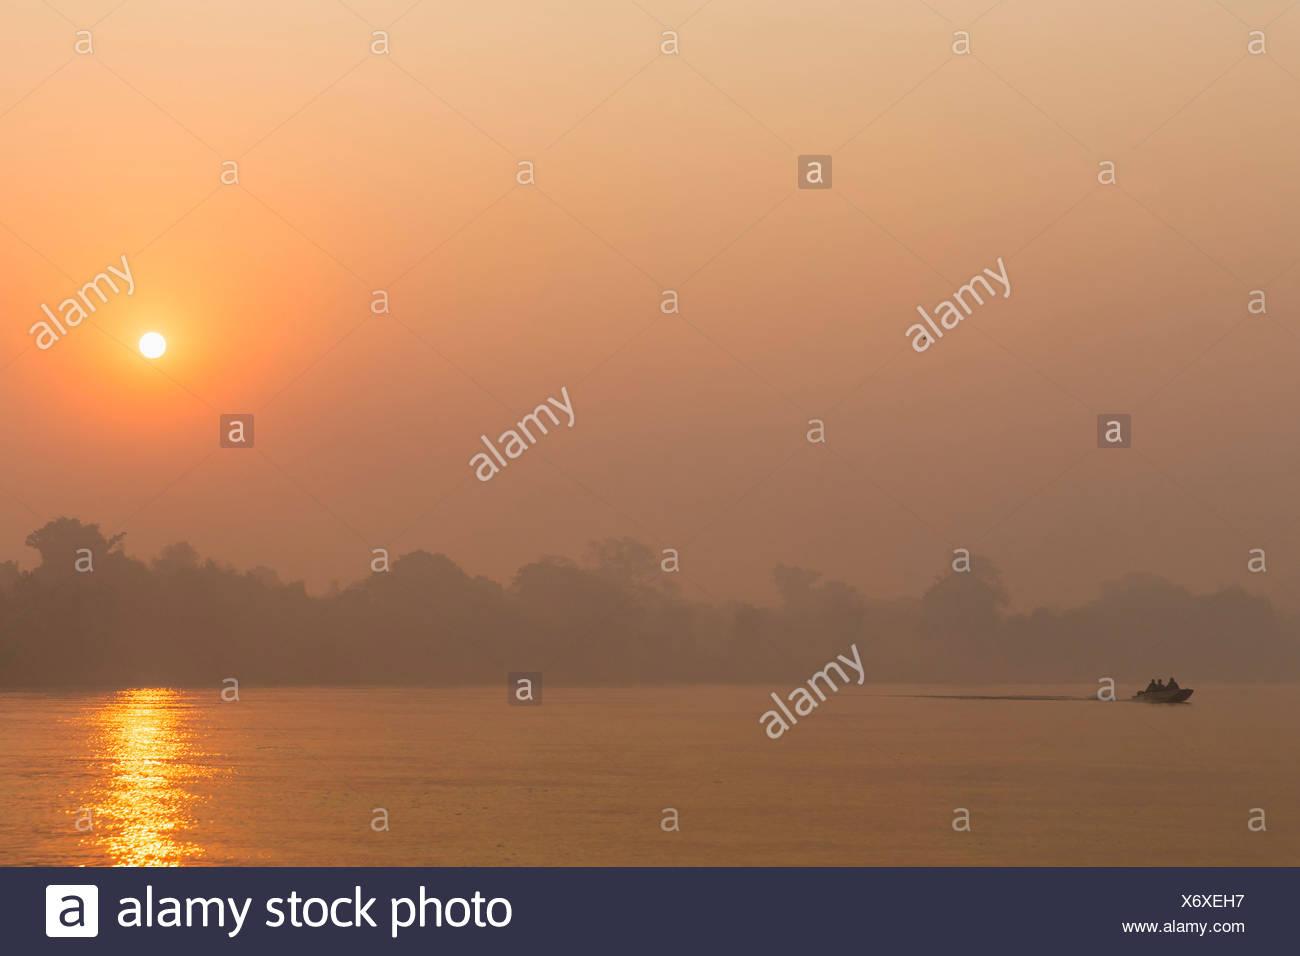 Brazil, Mato Grosso do Sul, Pantanal, Cuiaba River, Forest fire at sunrise - Stock Image